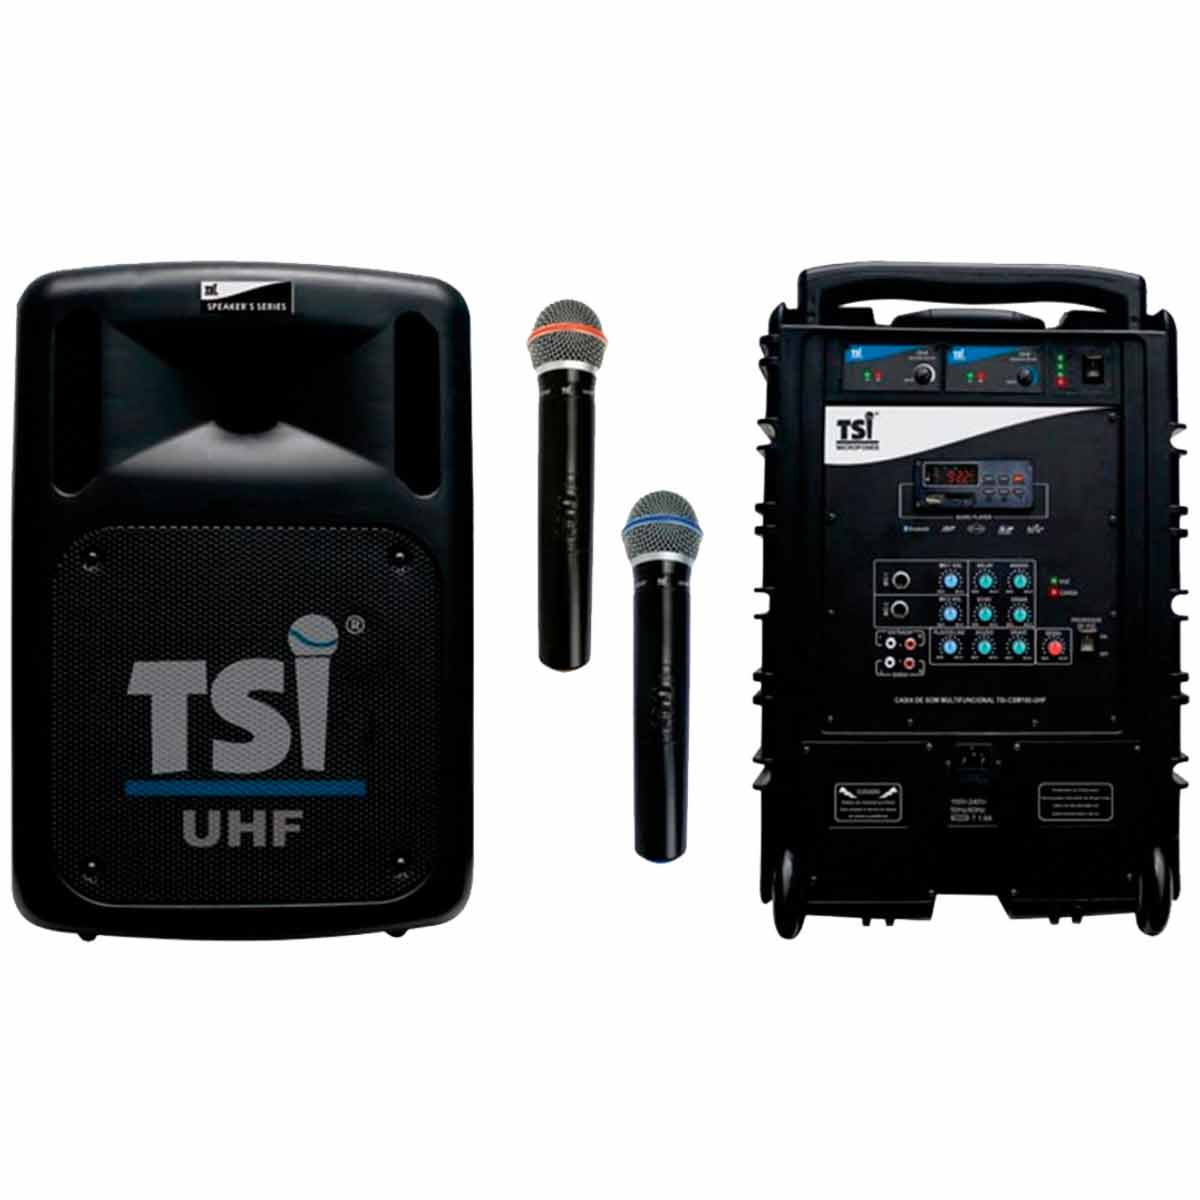 Caixa Port�til c/ Bateria, Bluetooth, USB e Microfone CSM 100-UHF - TSI